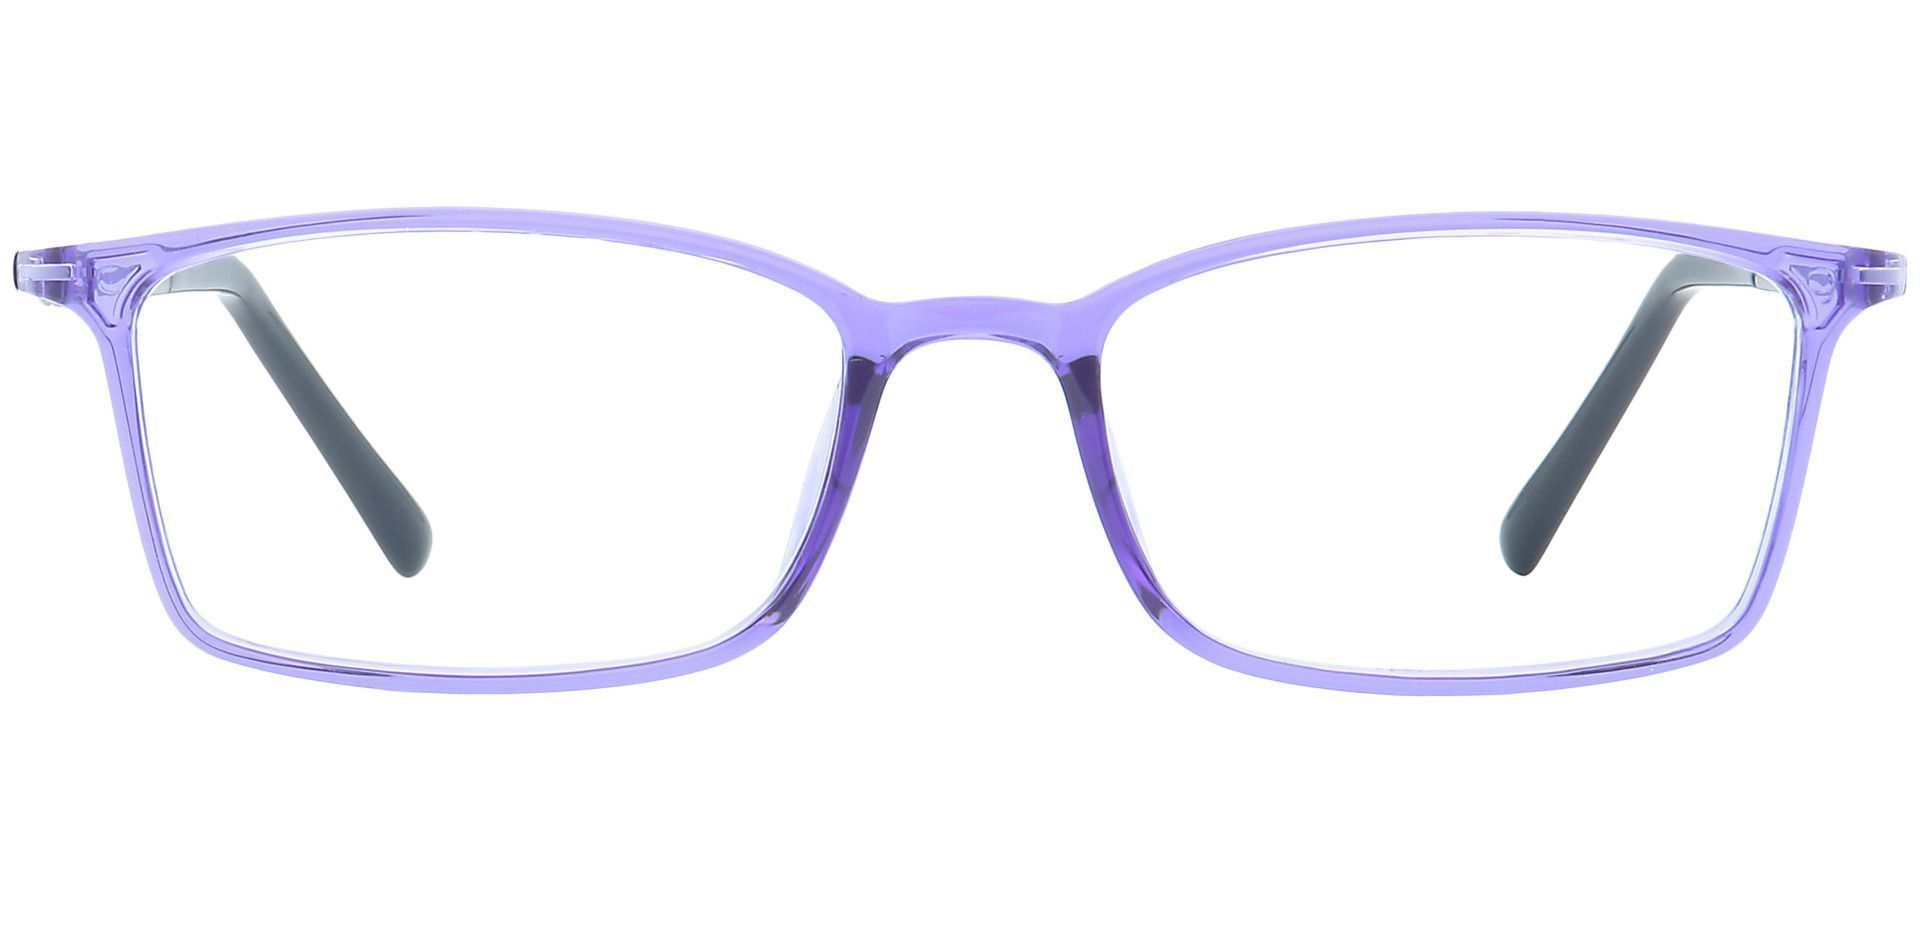 Kai Rectangle Prescription Glasses - Purple